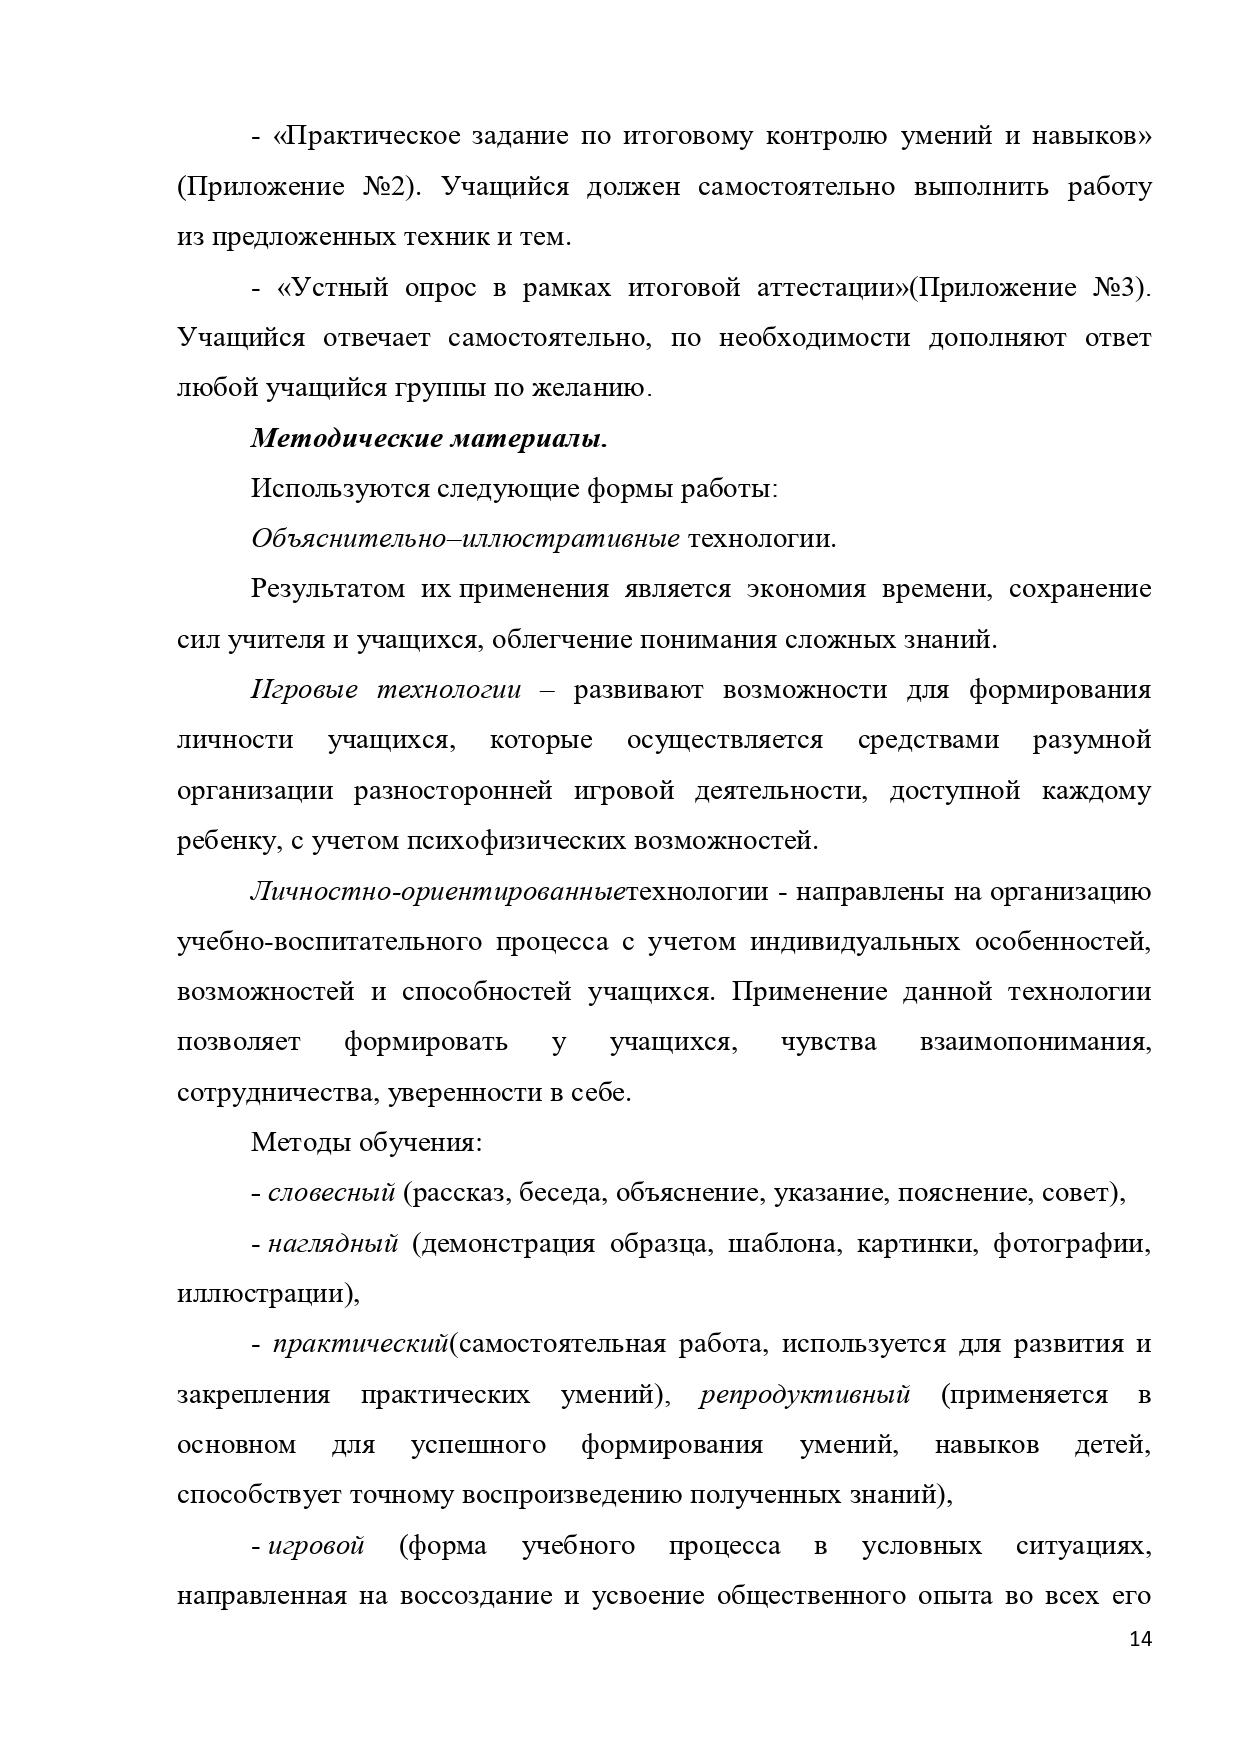 ДООП От познания к творчеству_pages-to-jpg-0014